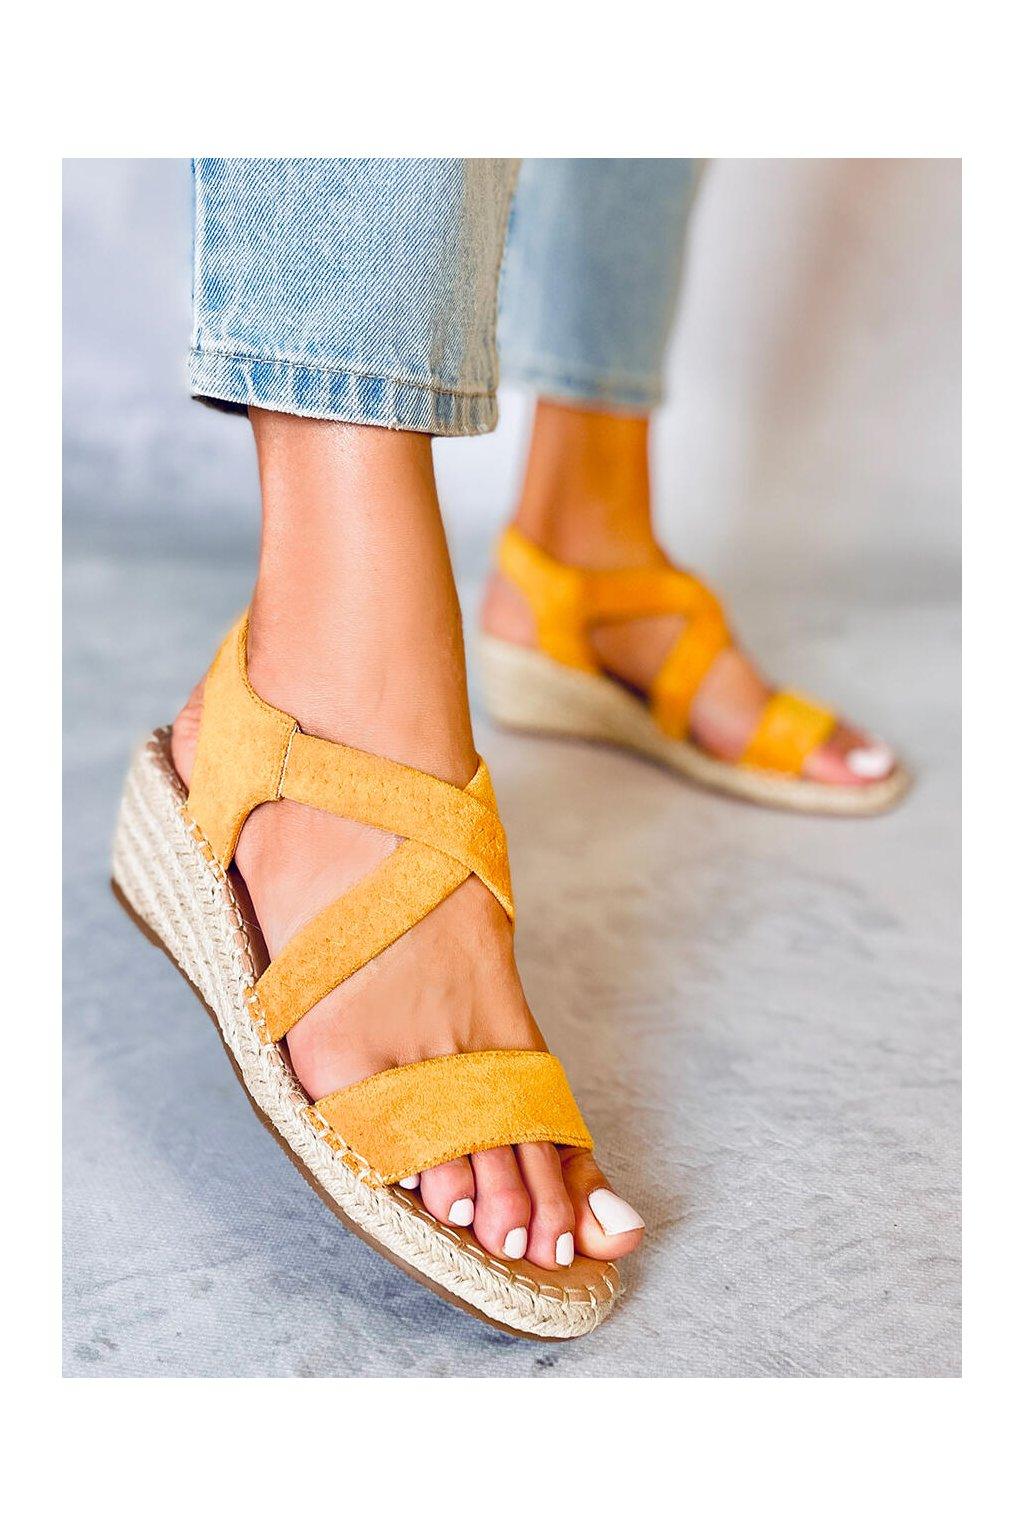 Dámske sandále žlté na platforme S-823